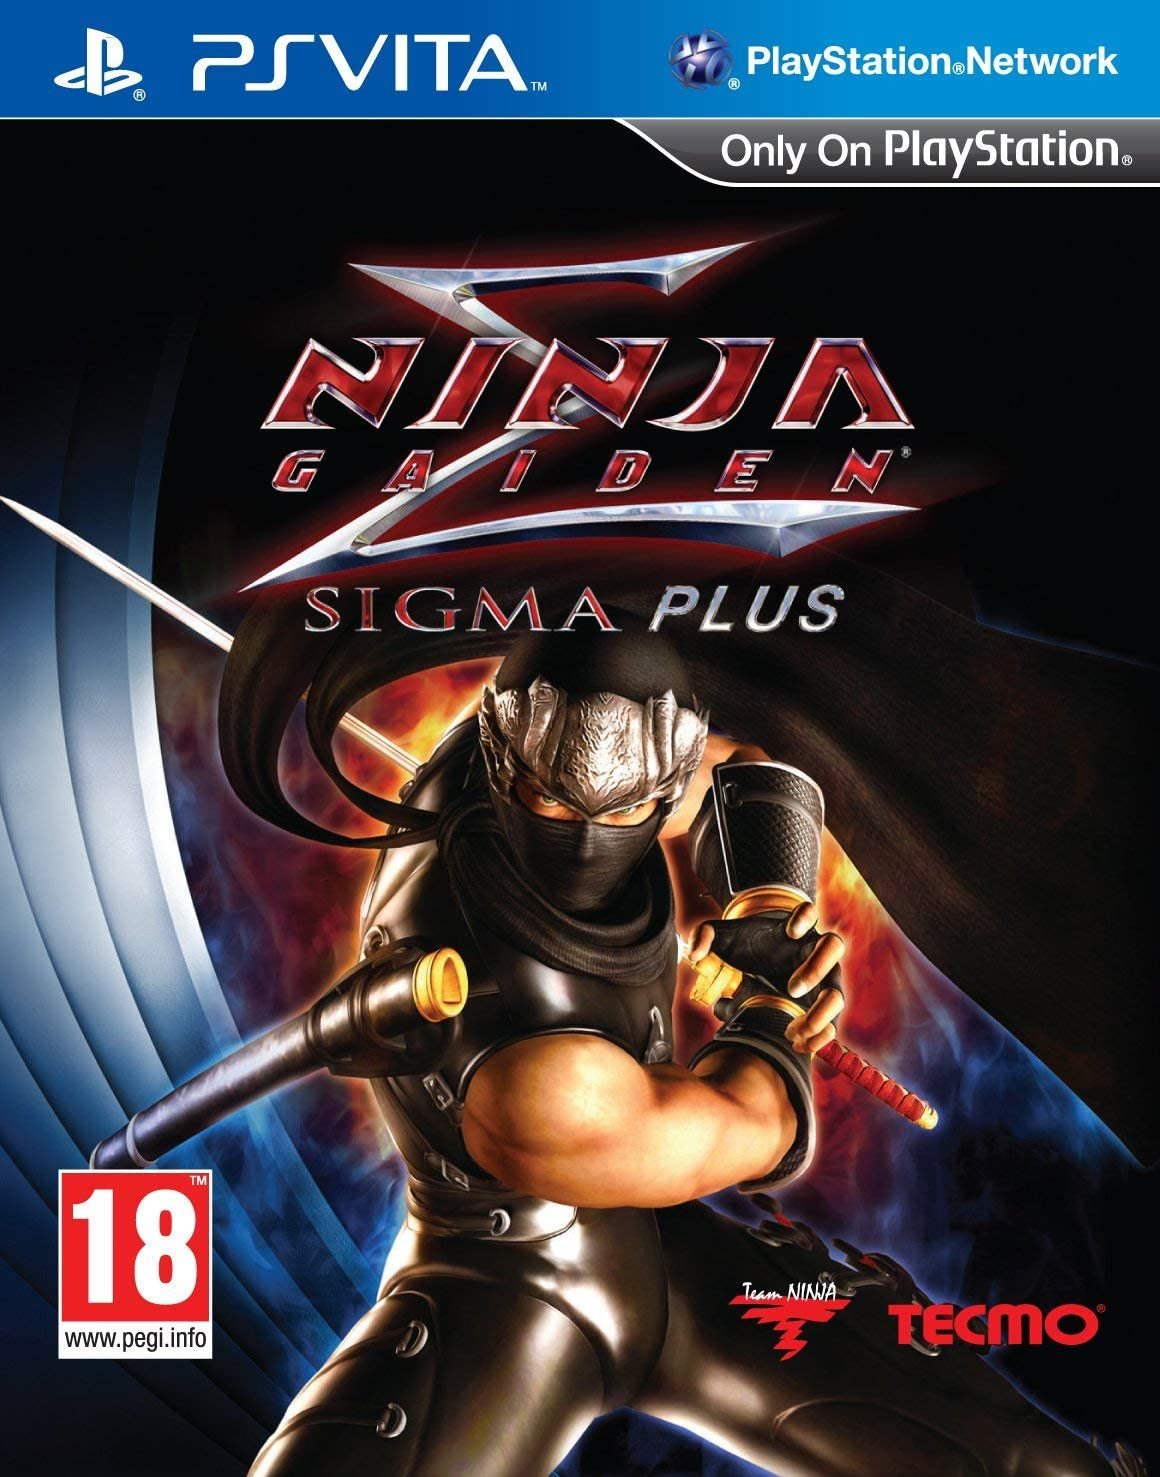 Amazon.com: Ninja Gaiden Sigma Plus (PS Vita) (UK) (UK ...